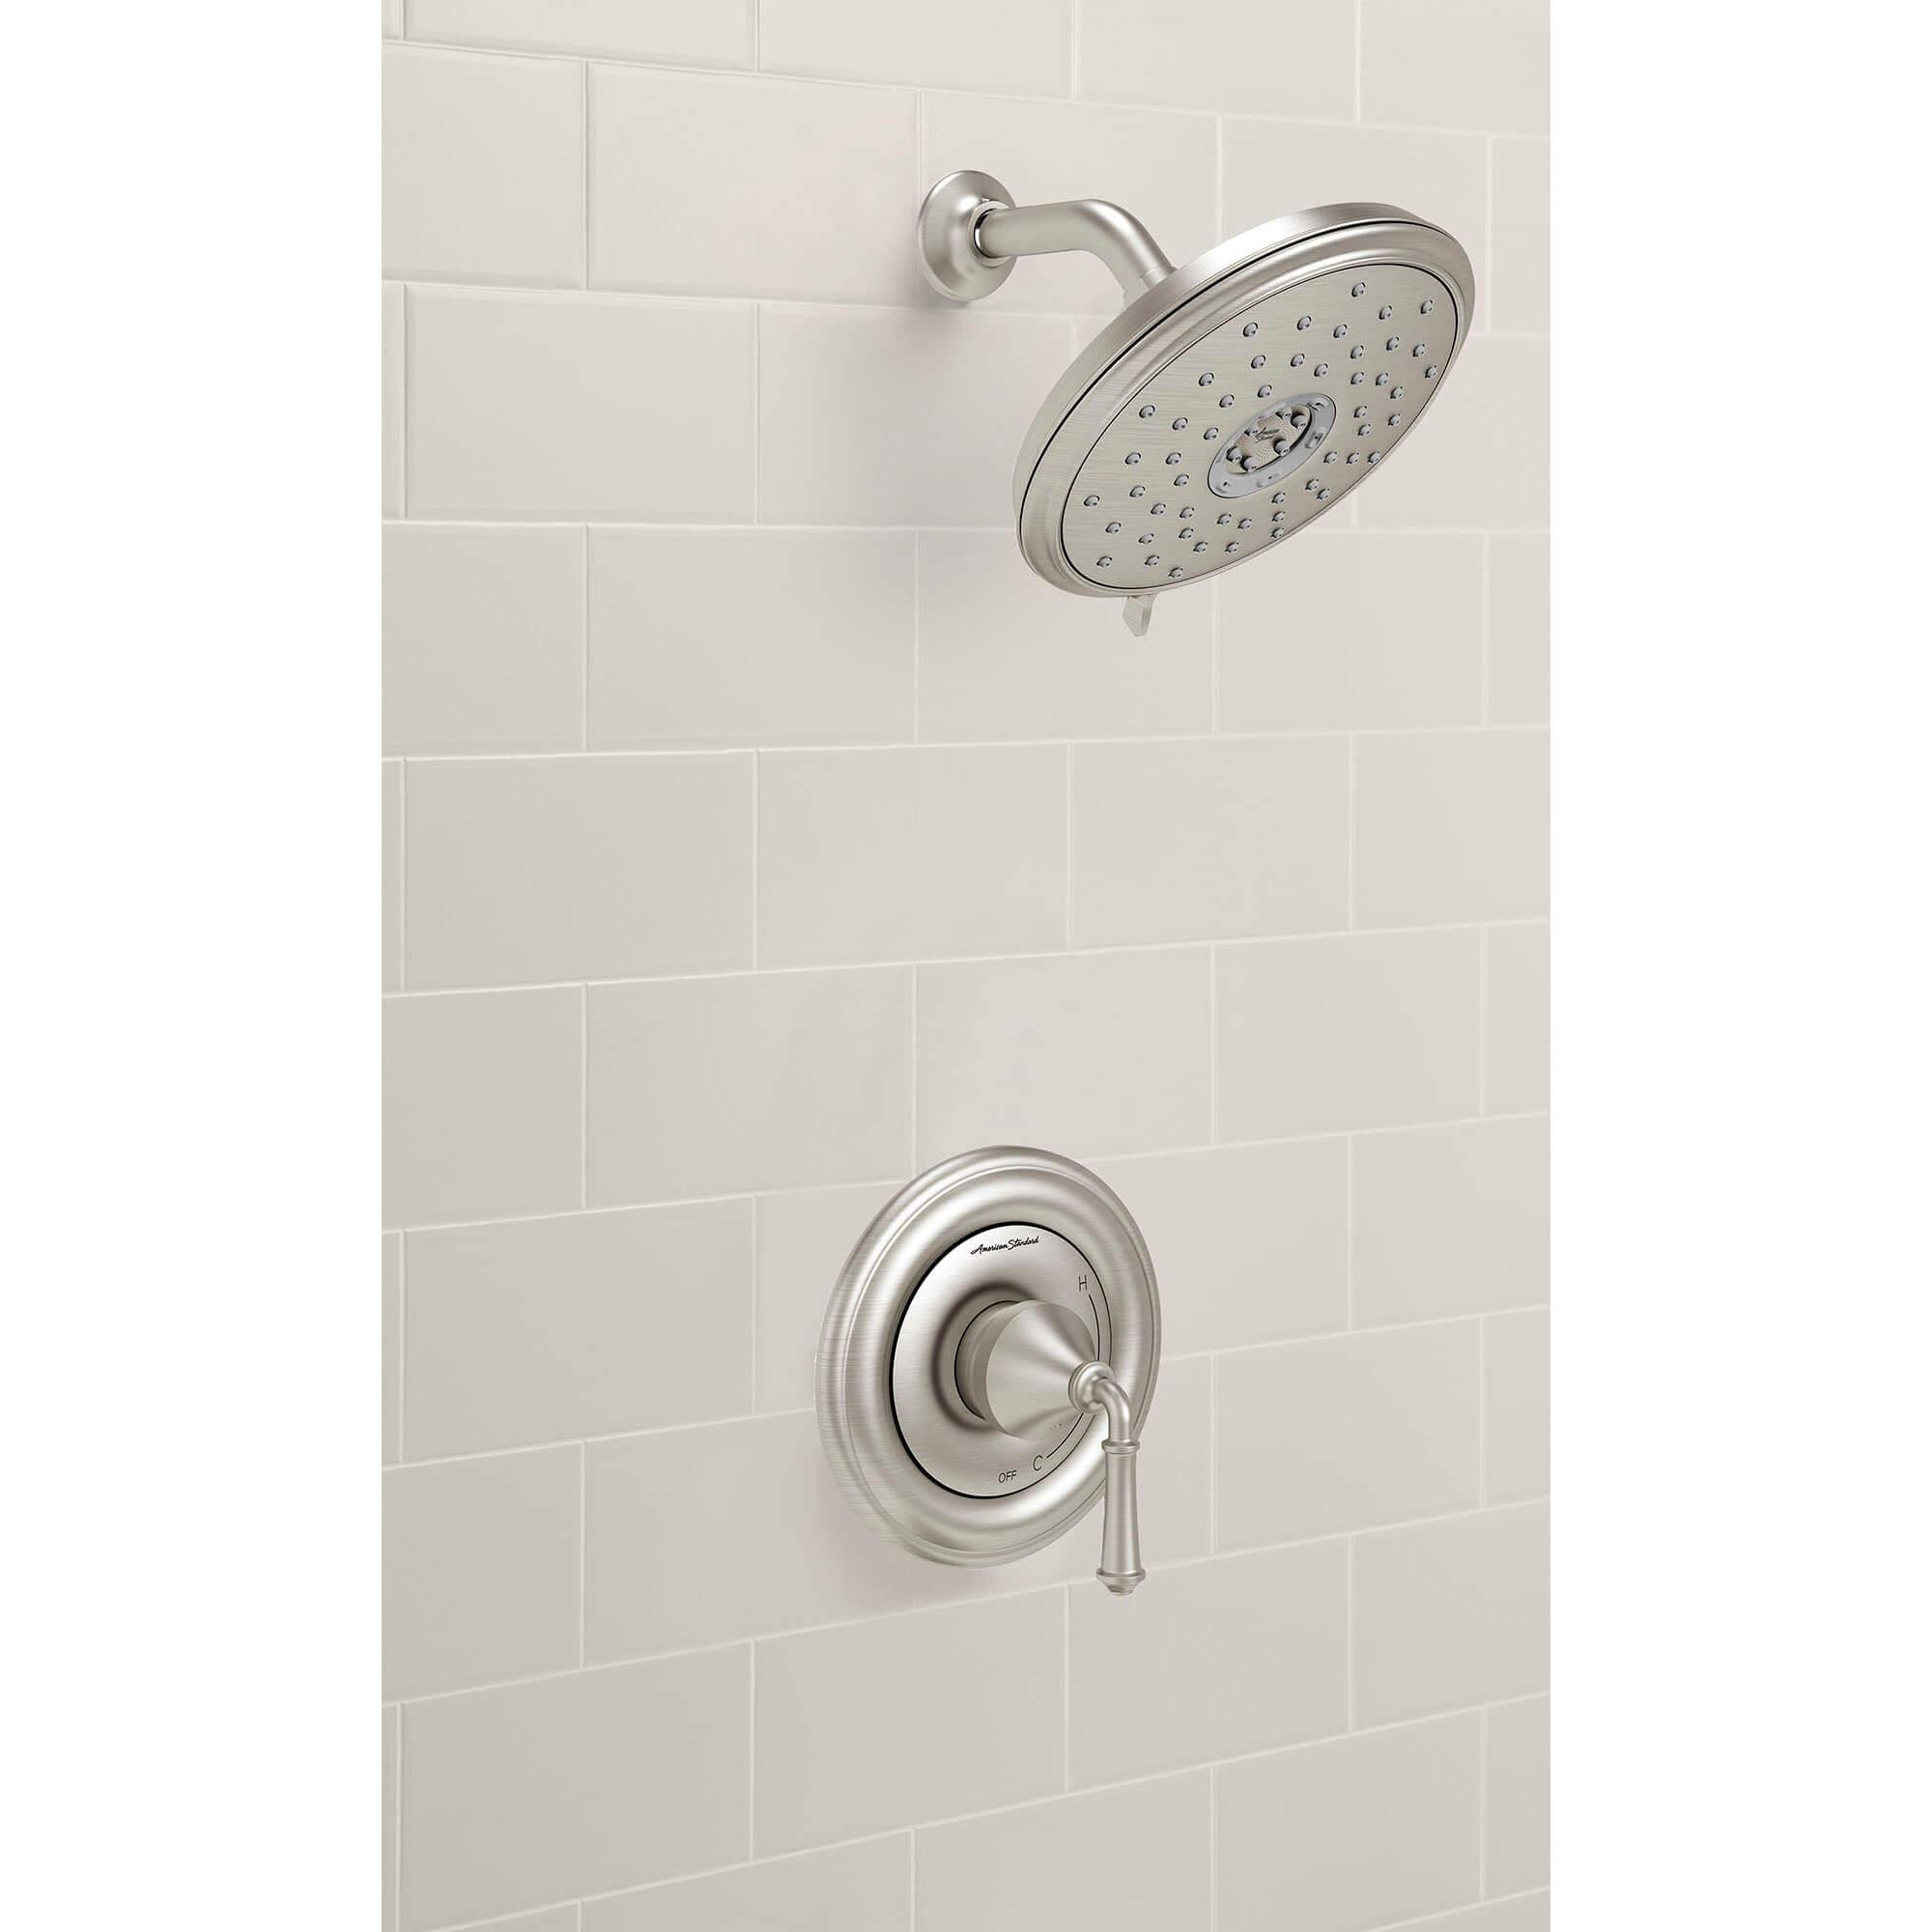 portsmouth balance pressure shower trim